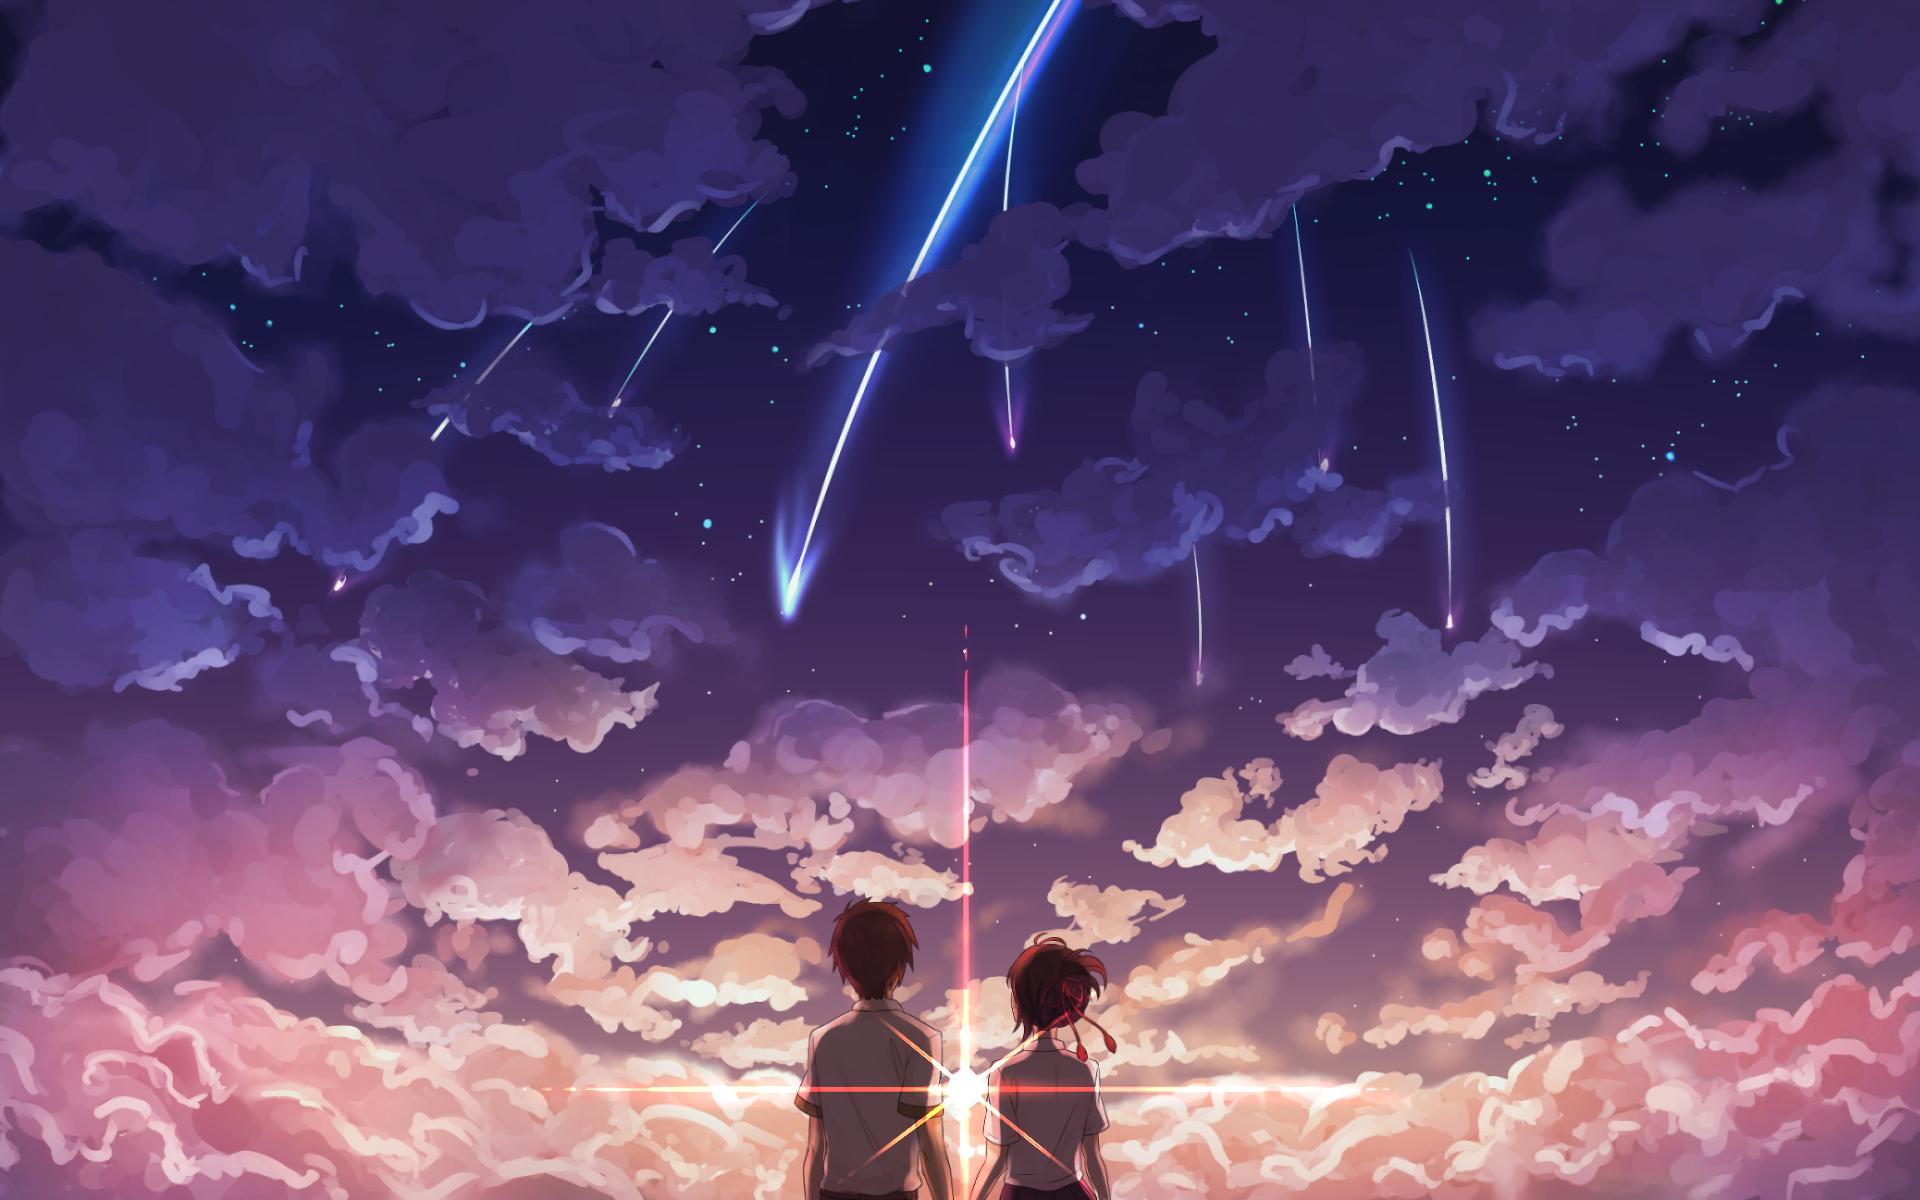 Anime Your Name Mitsuha Miyamizu Taki Tachibana Kimi No Na Wa Wallpaper Kimi No Na Wa Wallpaper Your Name Anime Kimi No Na Wa